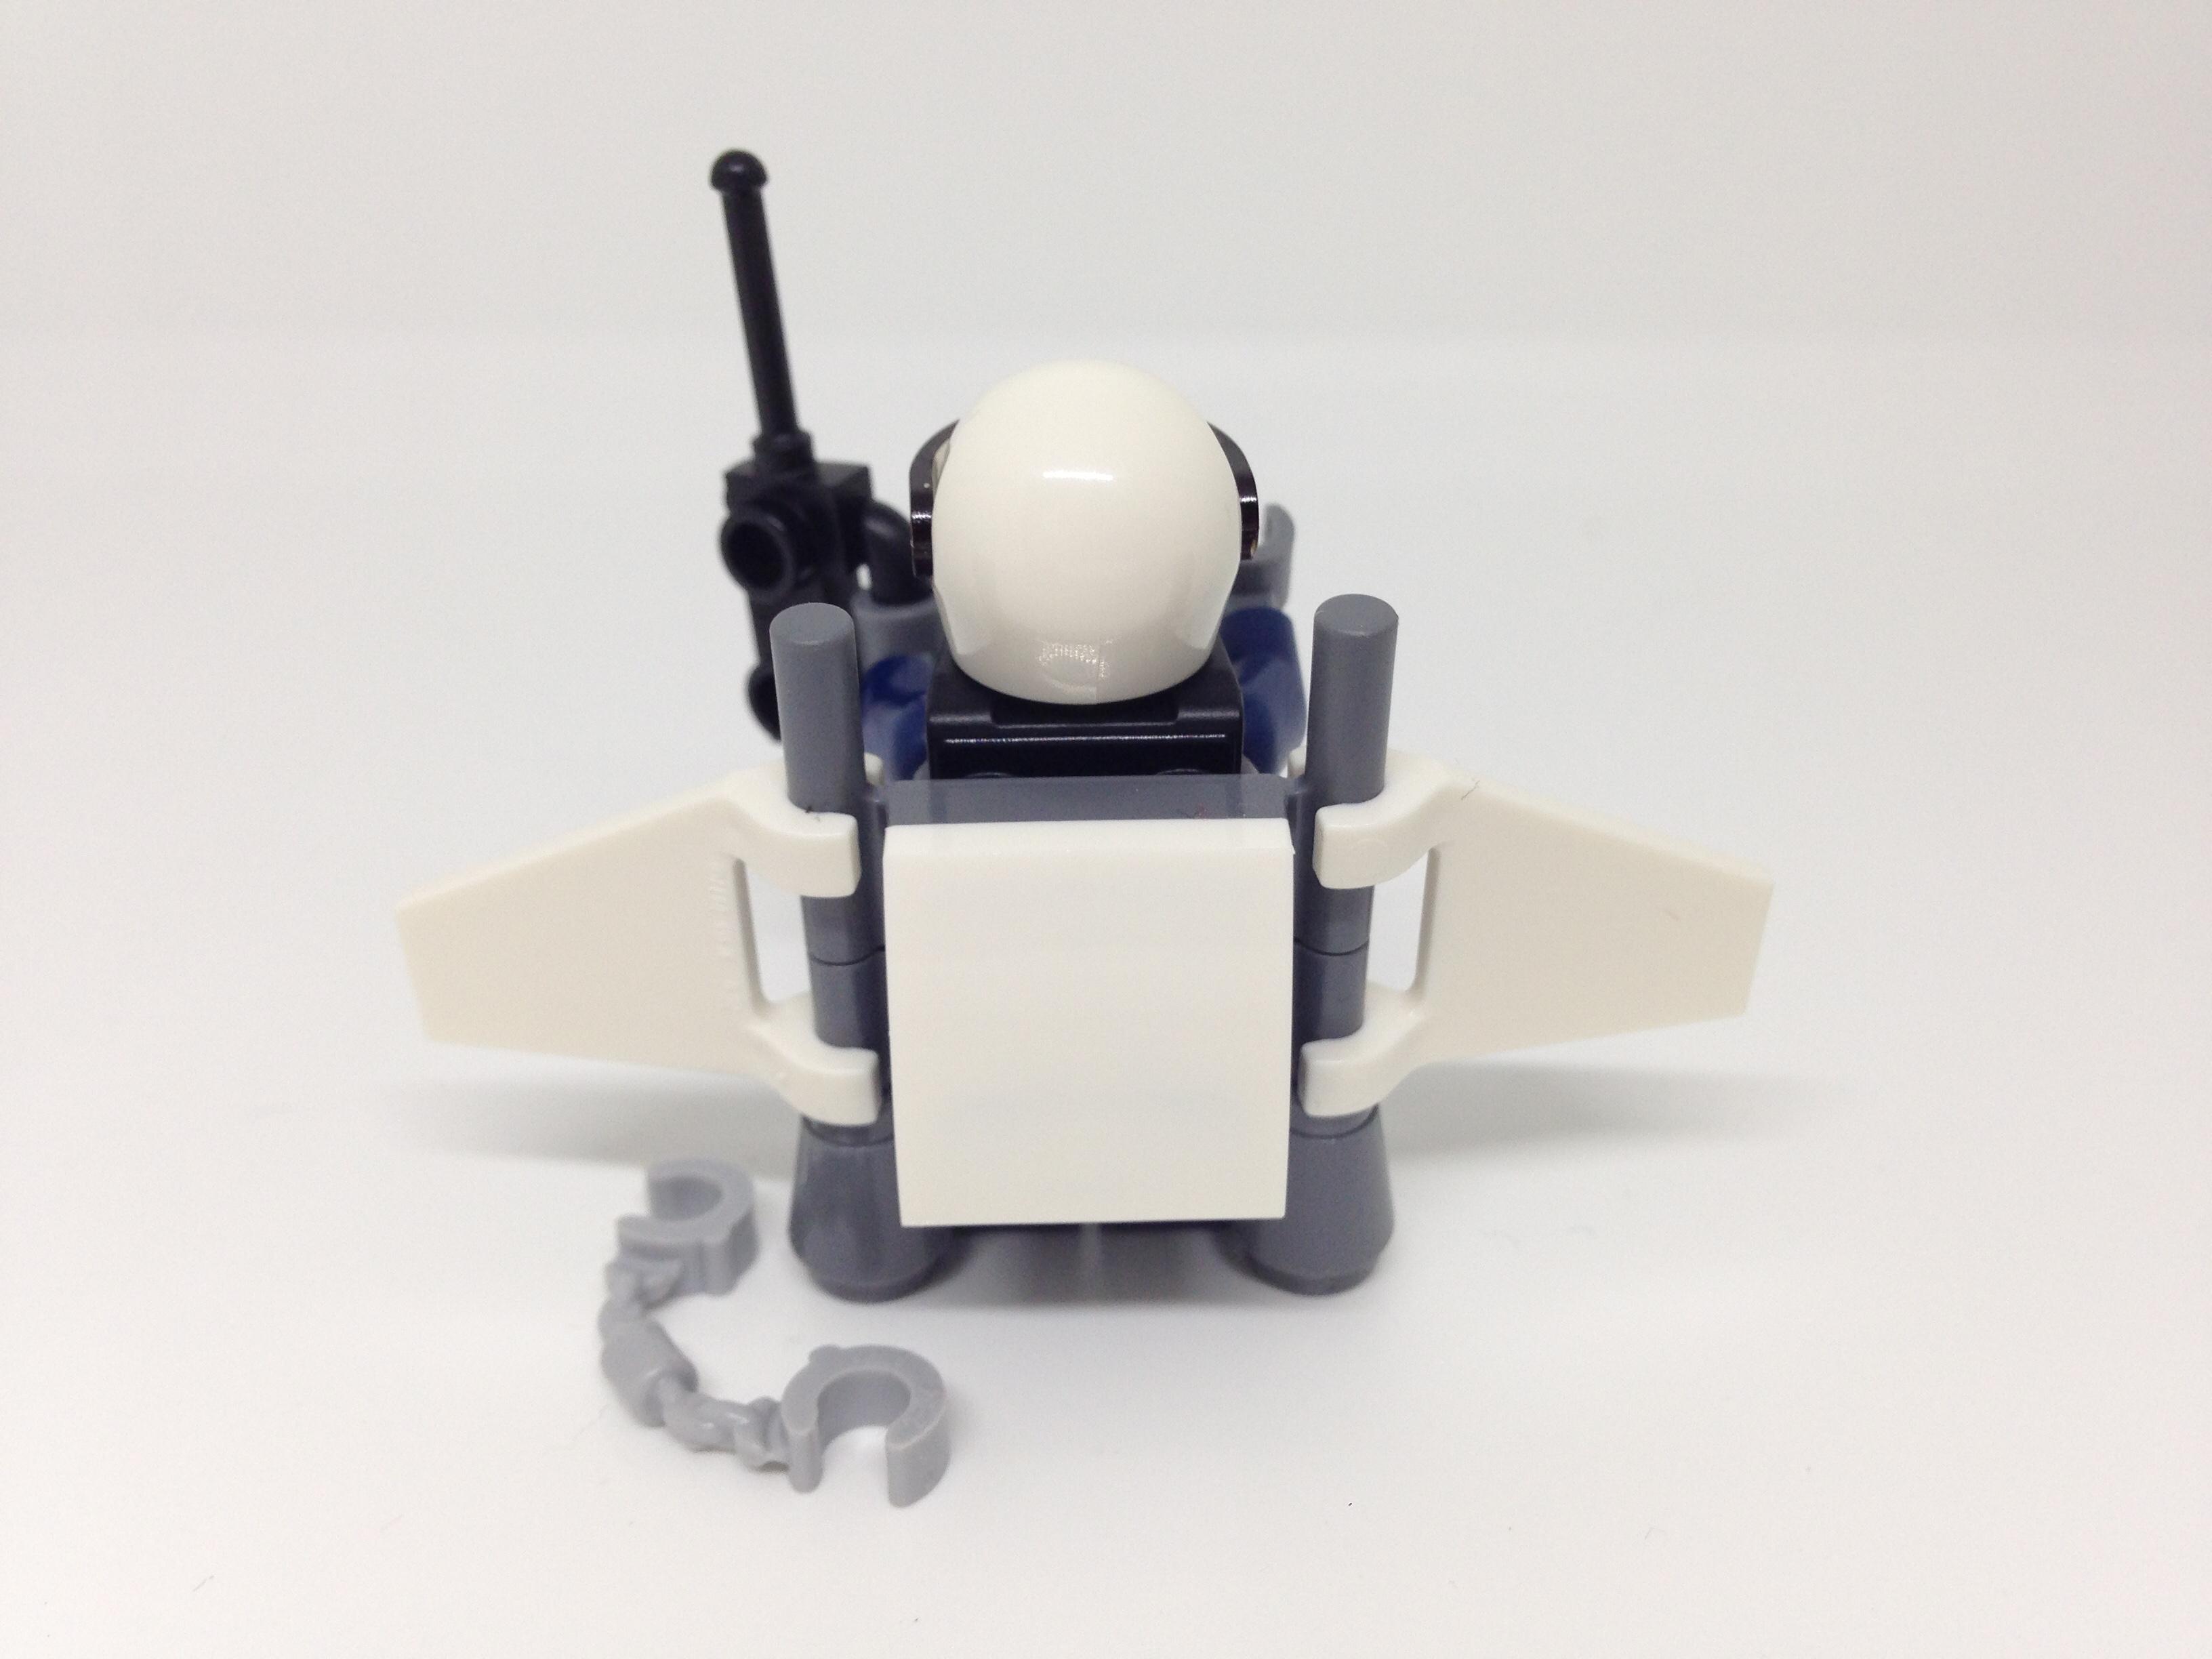 Lego City Sky Police Minifigure